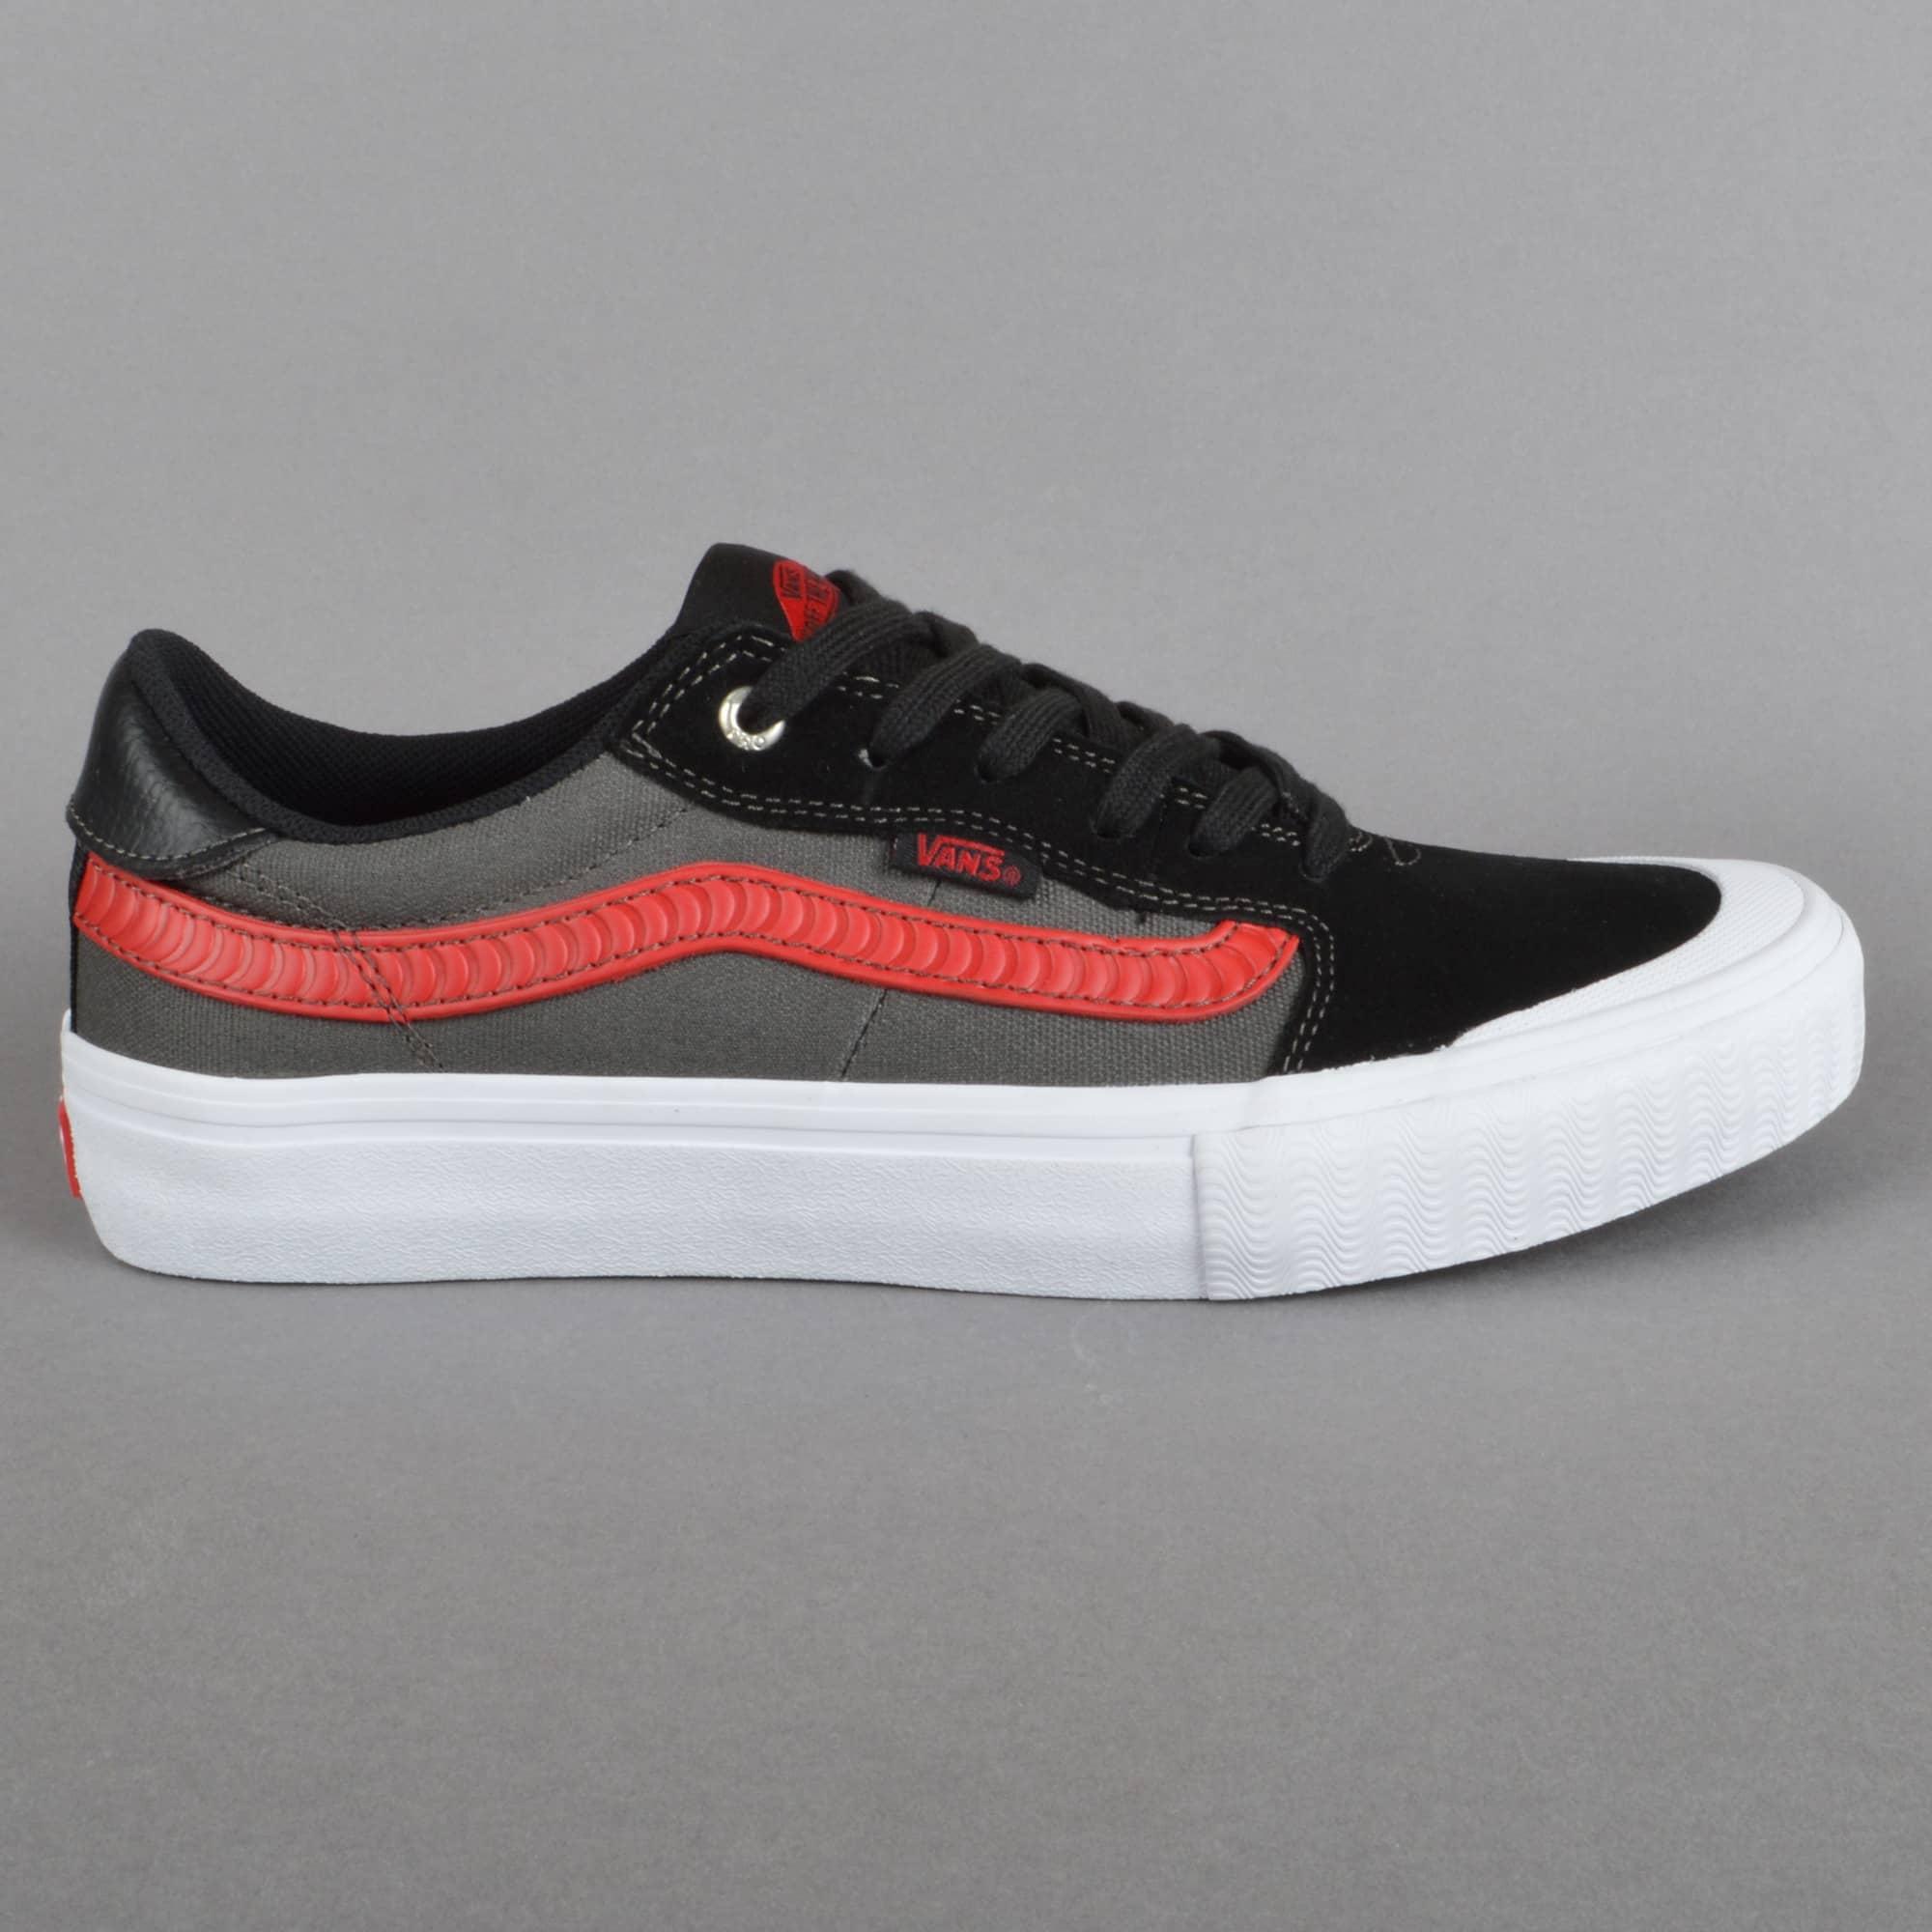 Vans Style 112 Pro Spitfire Skate Shoes